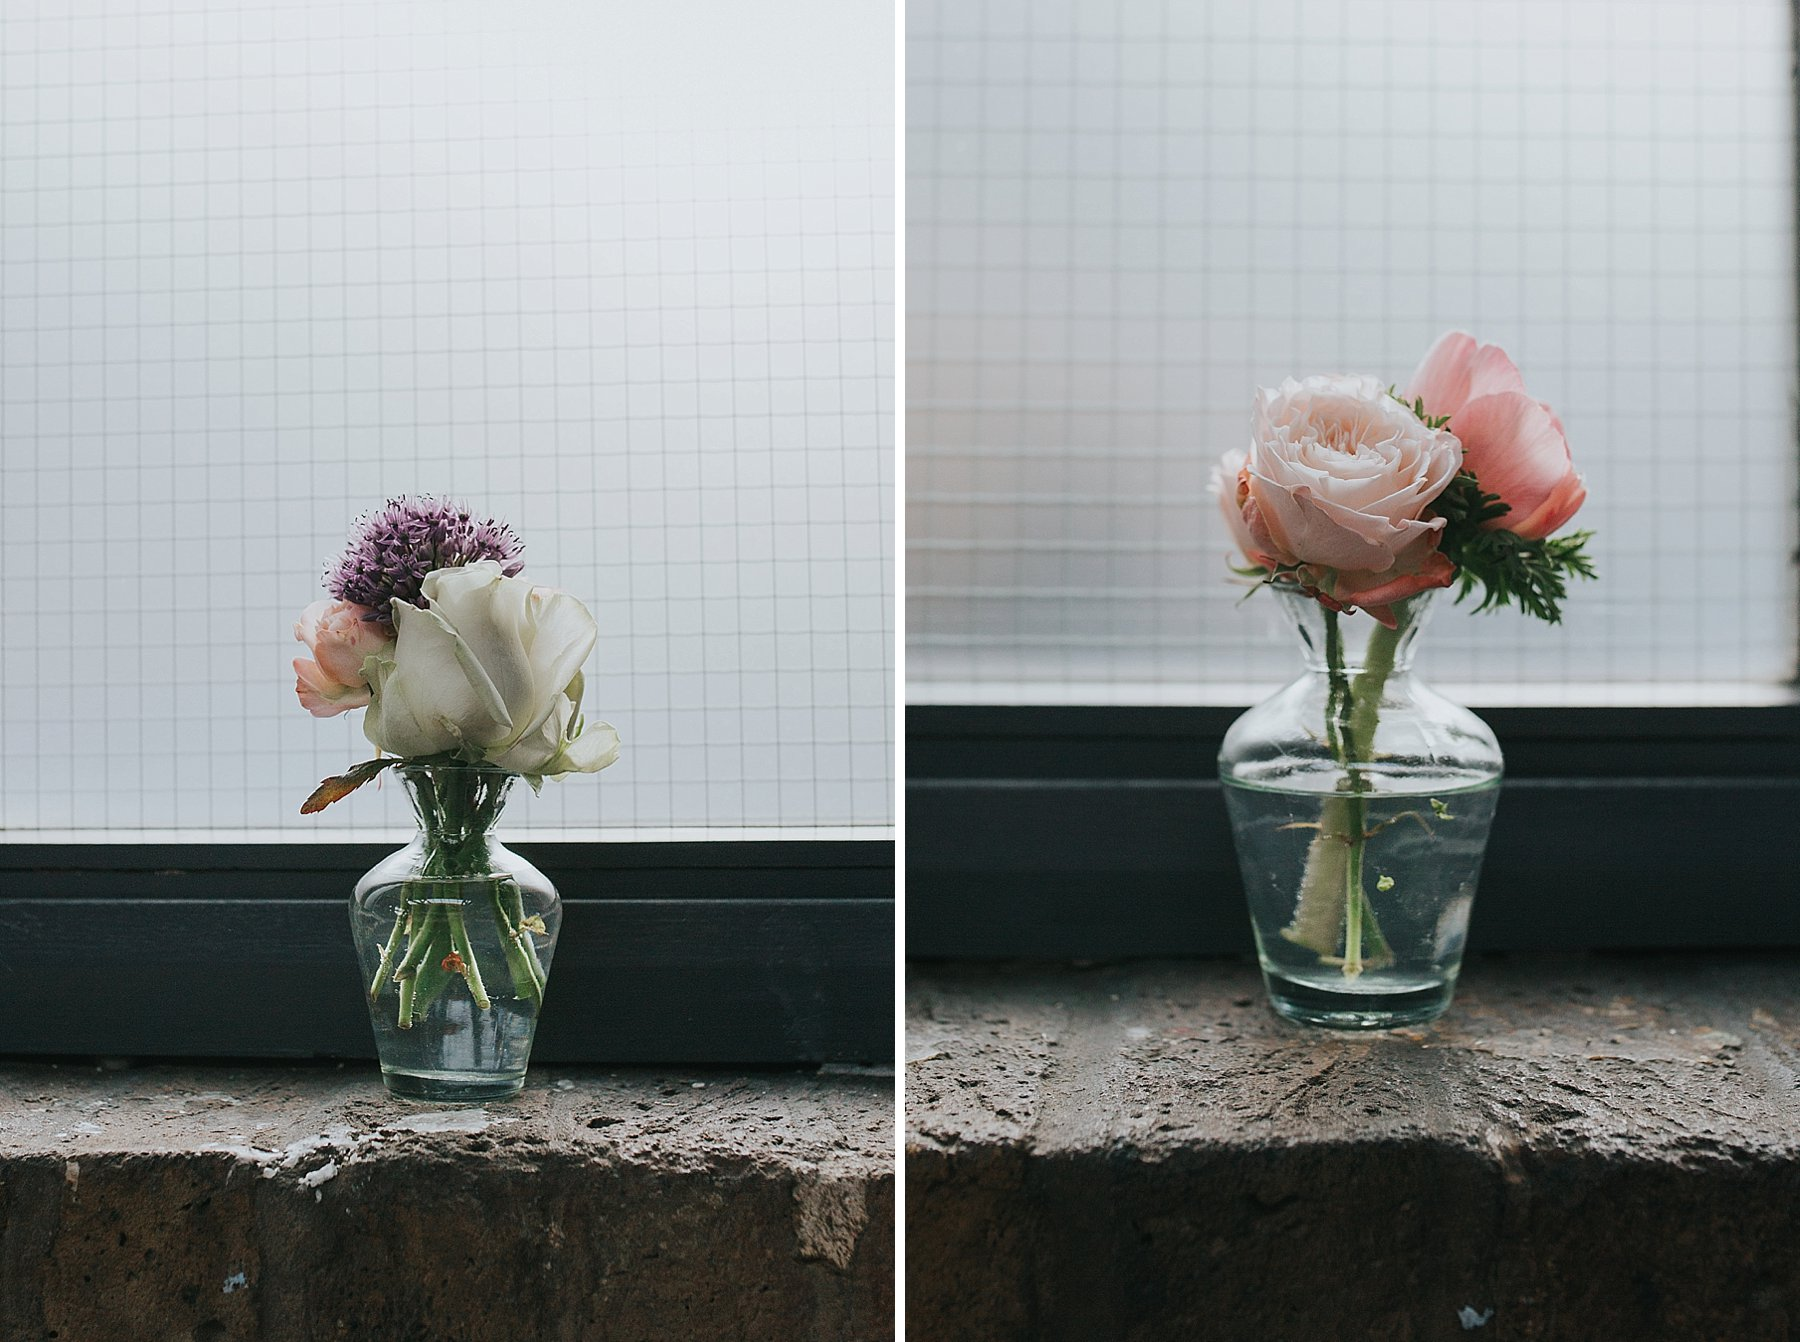 19-St Chads Place wedding rose flower posies in window frame.jpg